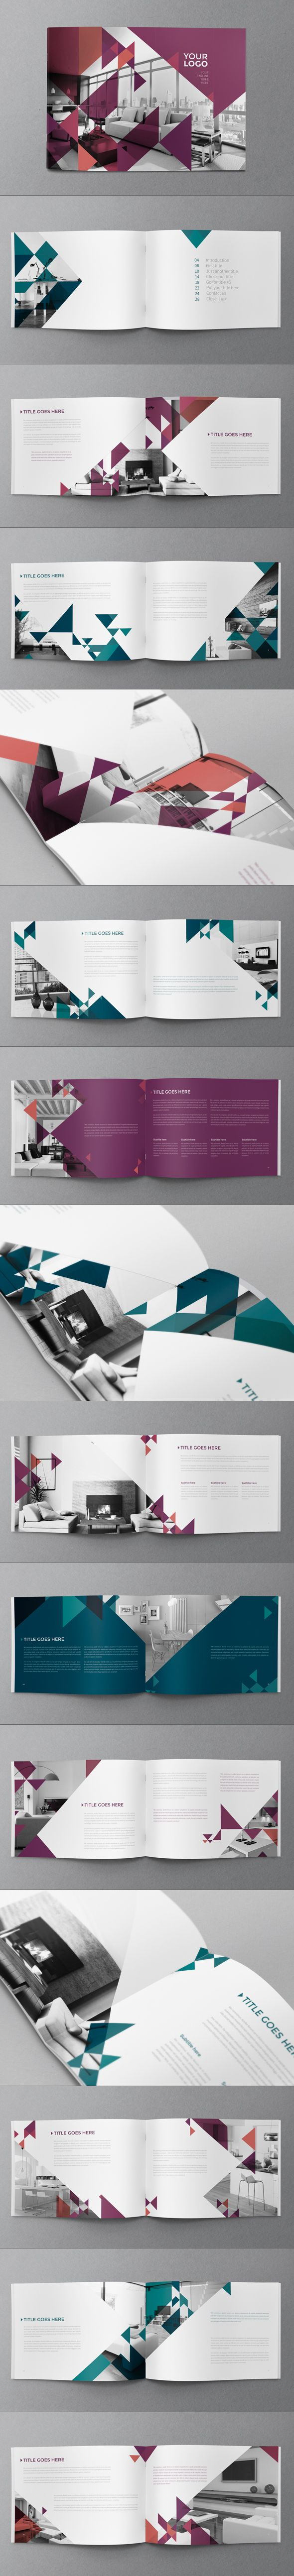 Modern Red Blue Brochure by Abra Design, via Behance